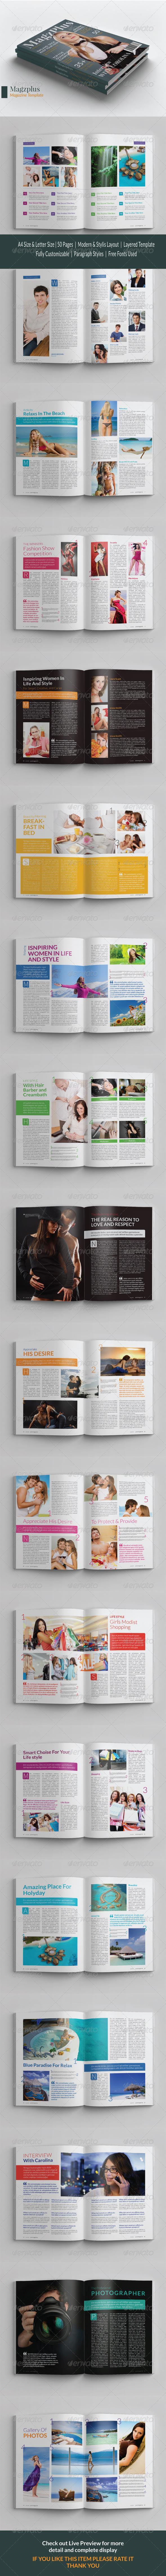 A4 / Letter Magzplus Magazine Template - Magazines Print Templates